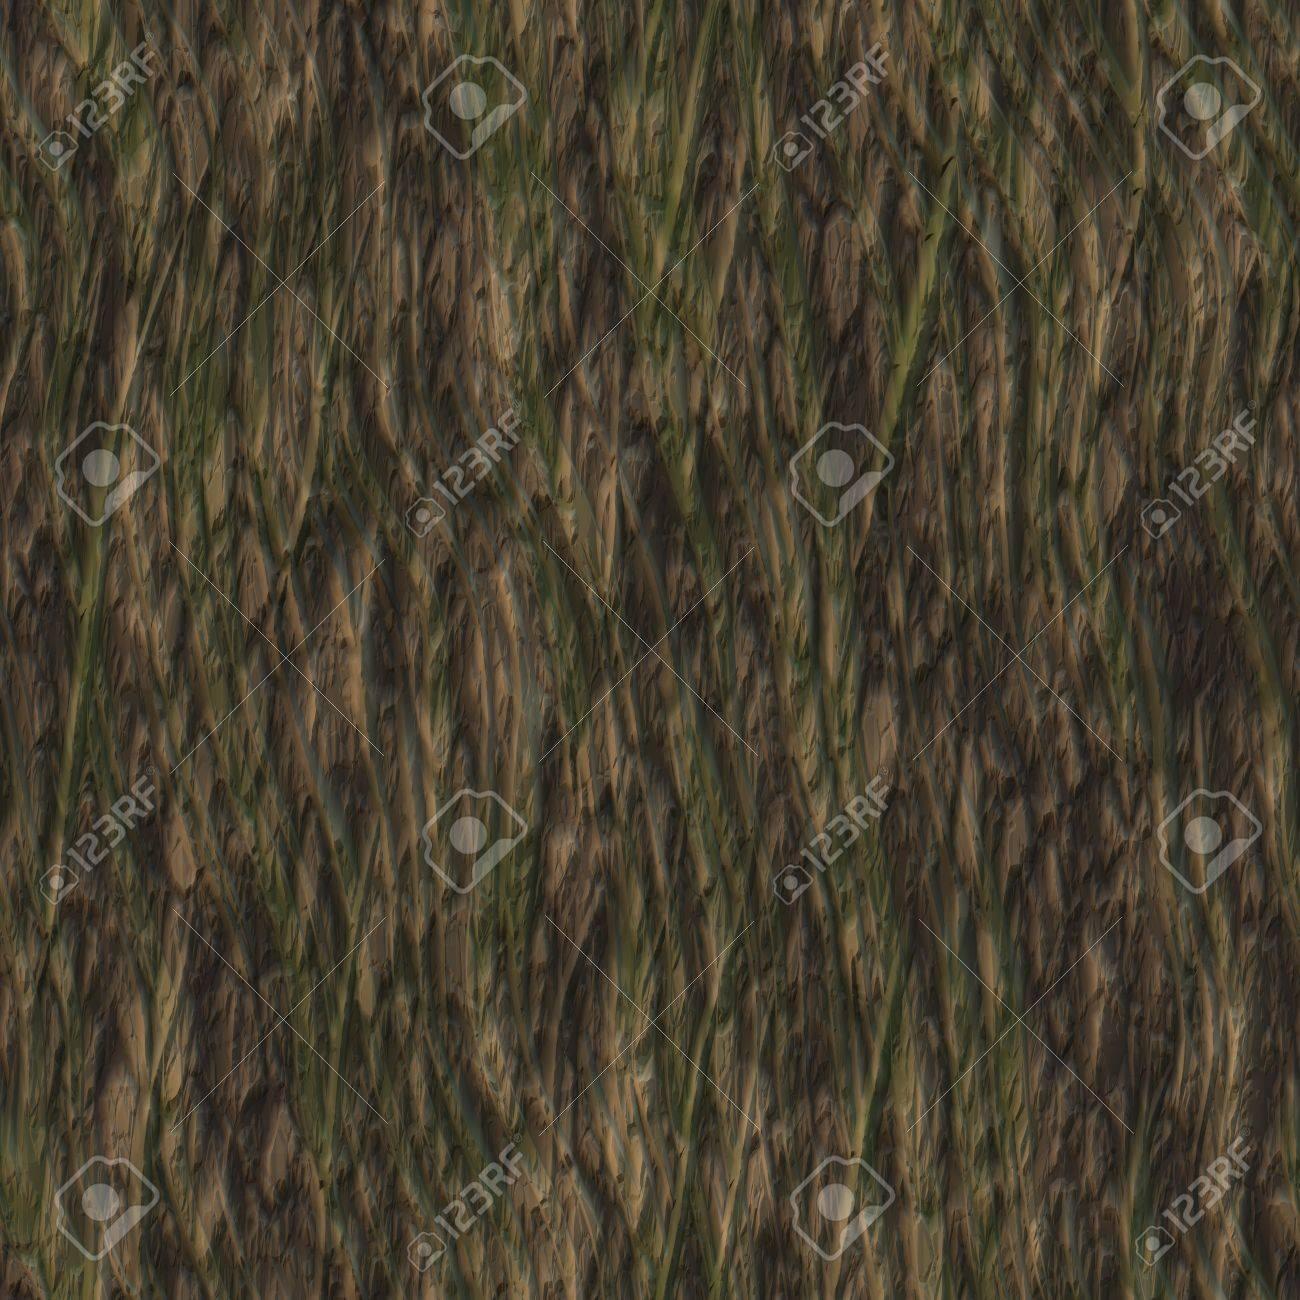 Seamless Tree Bark Wood Texture as Tileable Stock Photo - 6279255